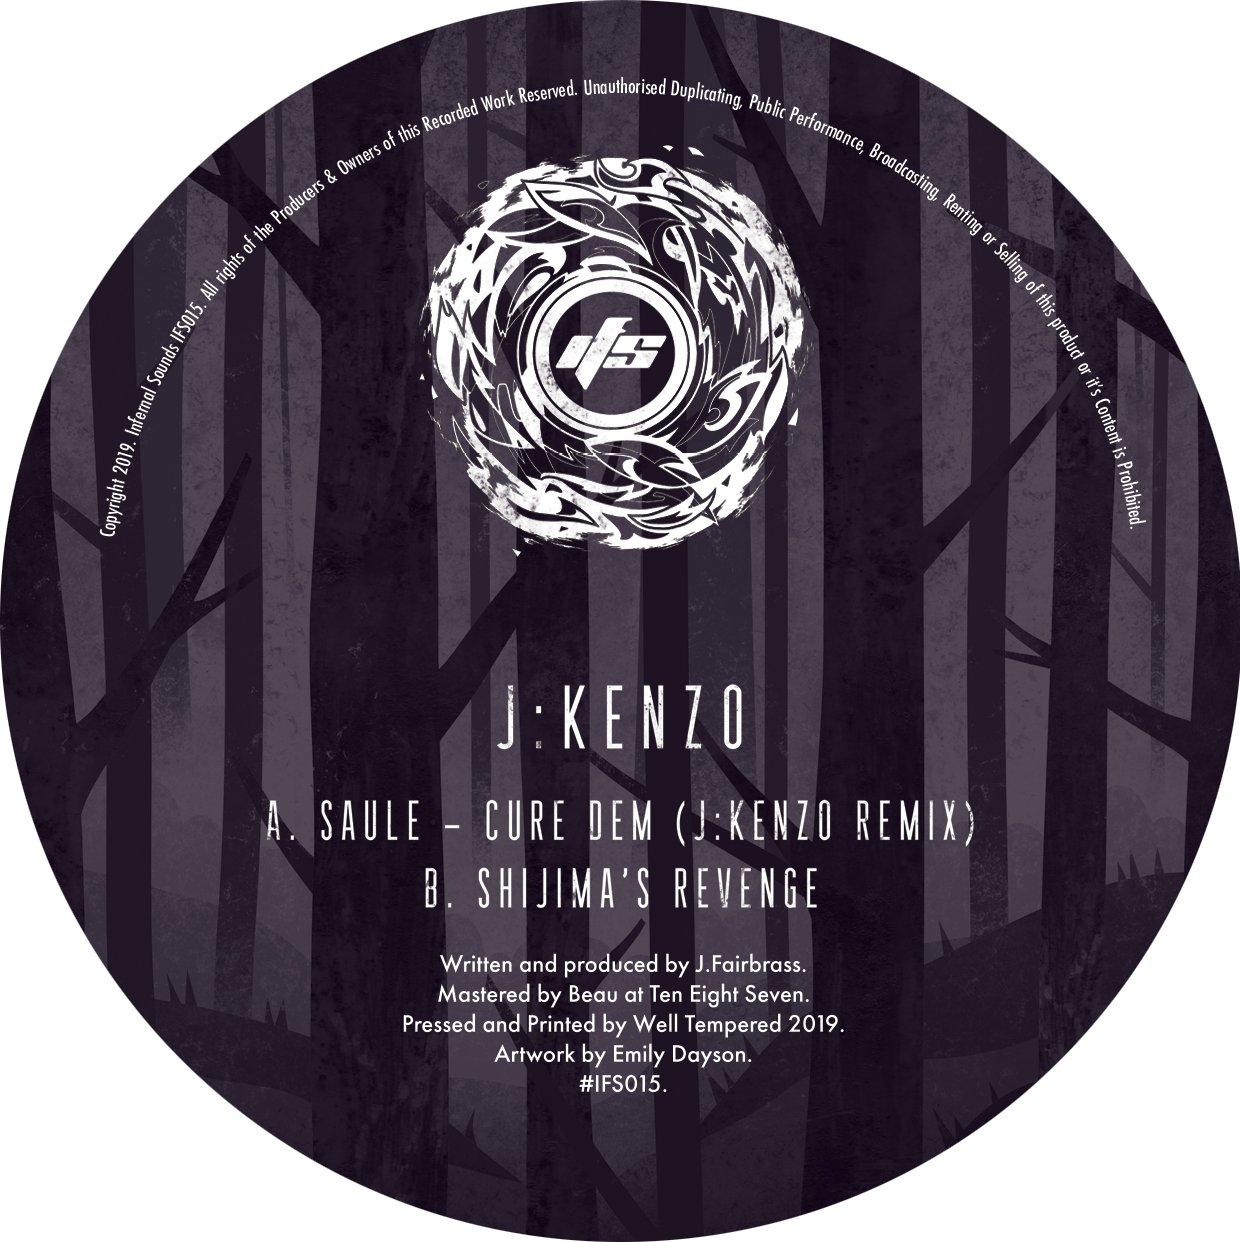 Image of IFS015: Saule - Cure Dem (J:Kenzo Remix) / Shijima's Revenge + Artwork Print [FULL SLEEVE ARTWORK]